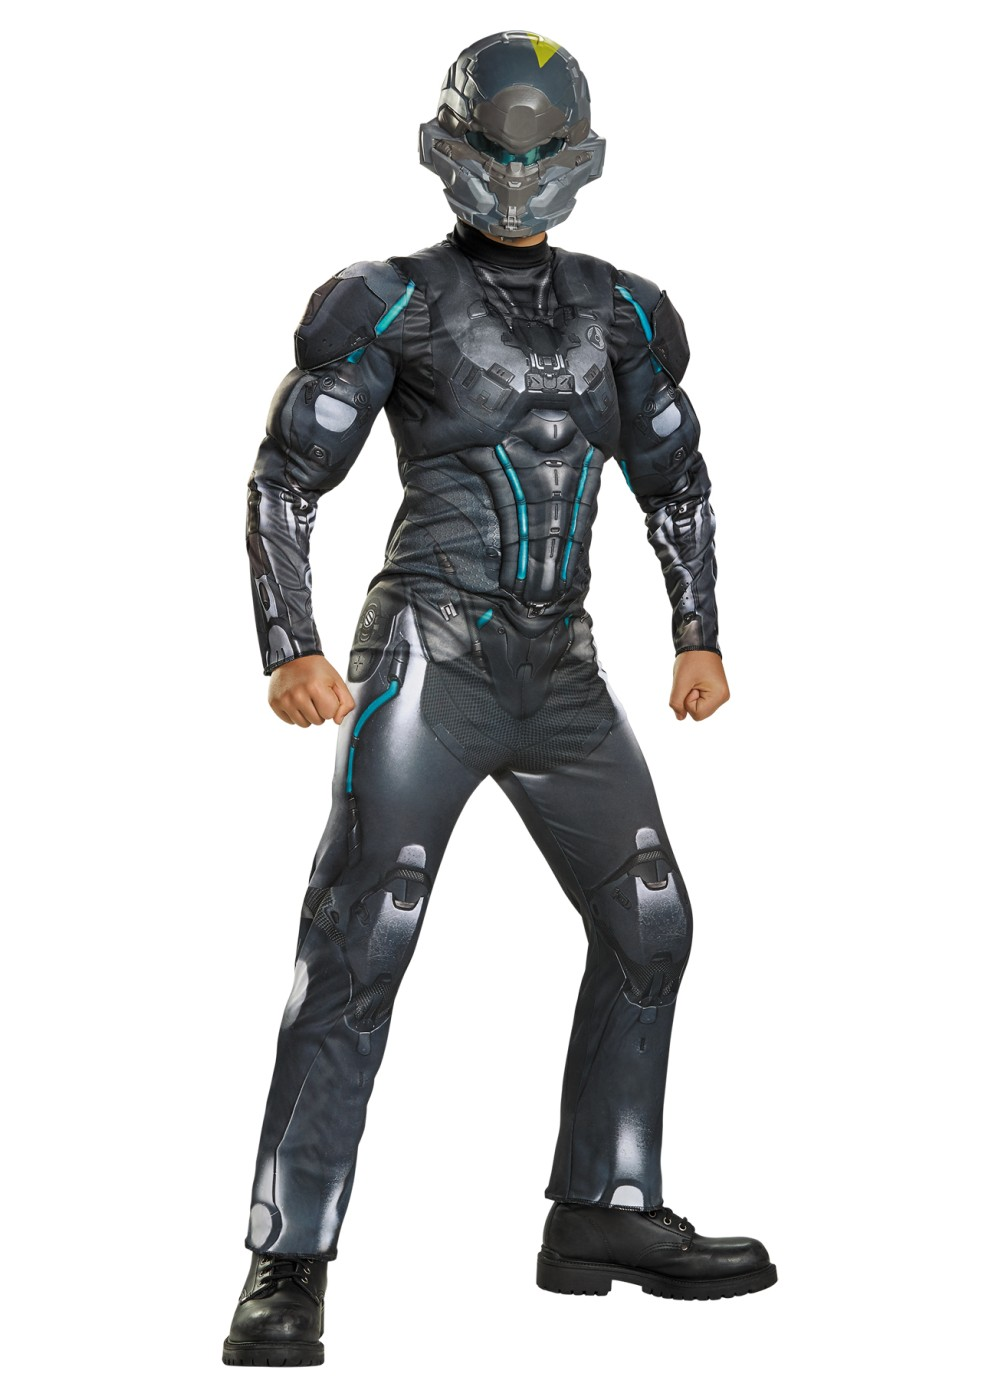 Spartan Locke Muscle Boys Costume Video Game Costumes